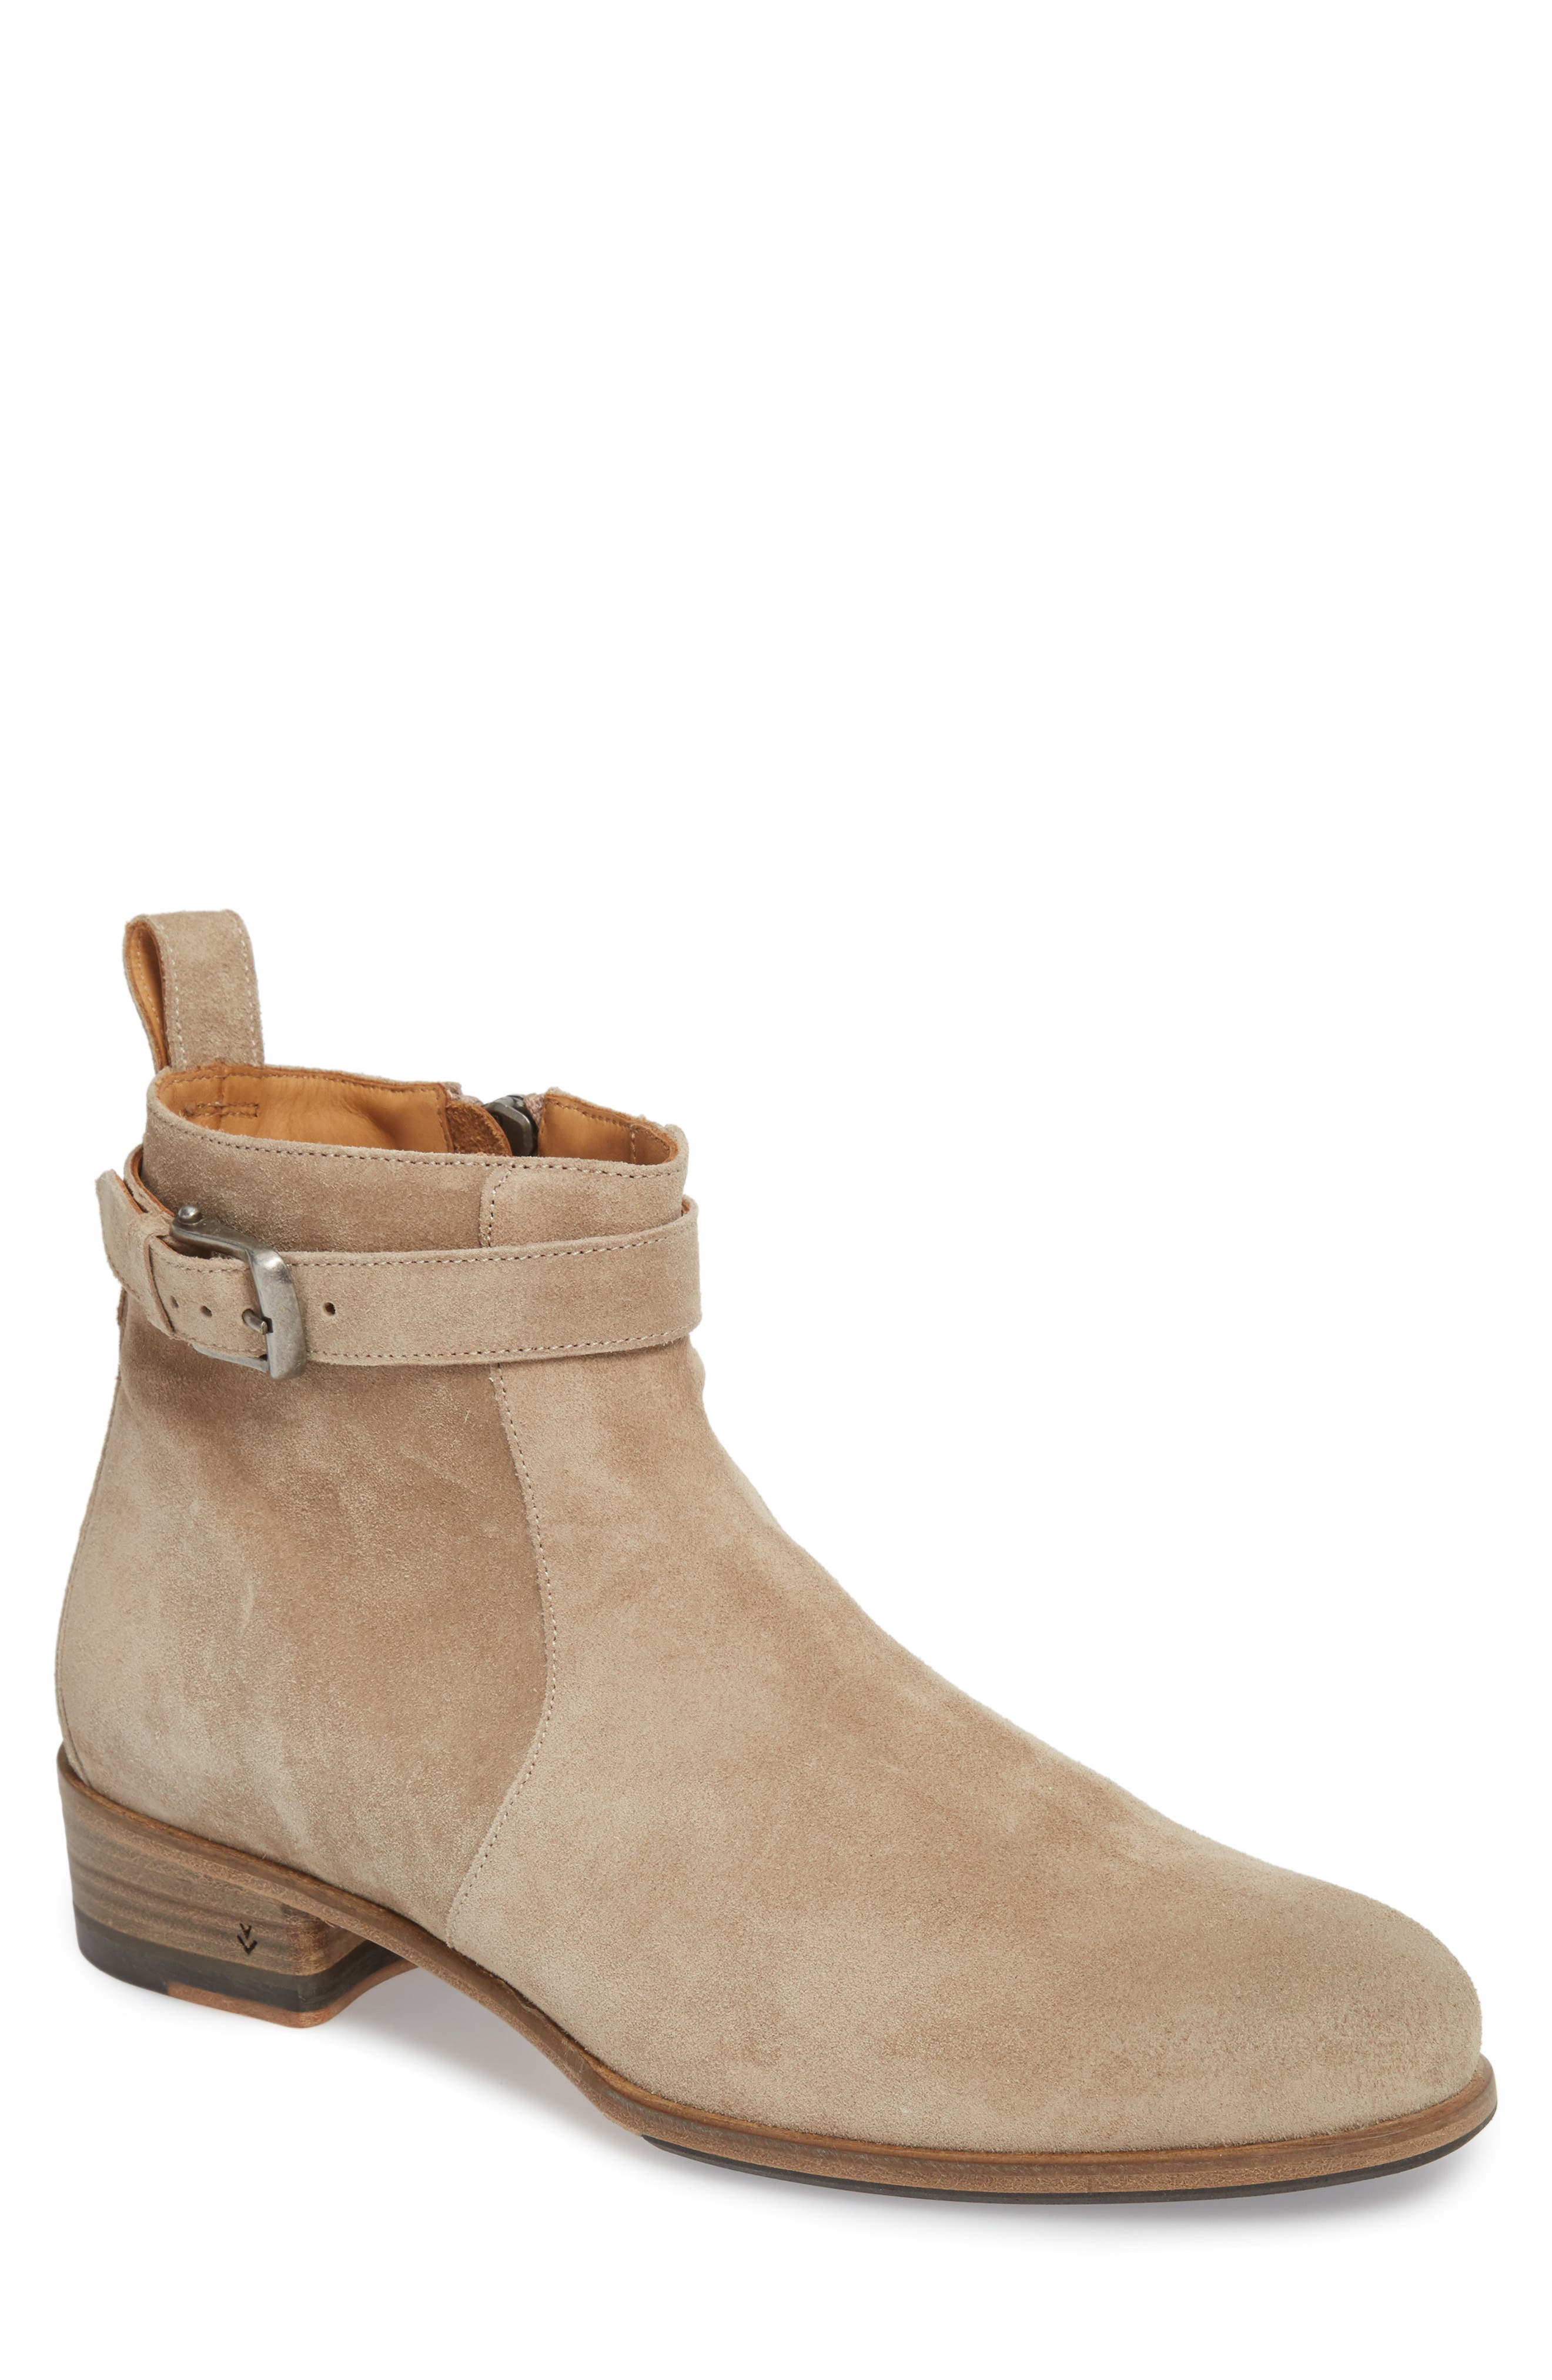 John Varvatos Lafayette Buckle Boot,                         Main,                         color, Twine Suede